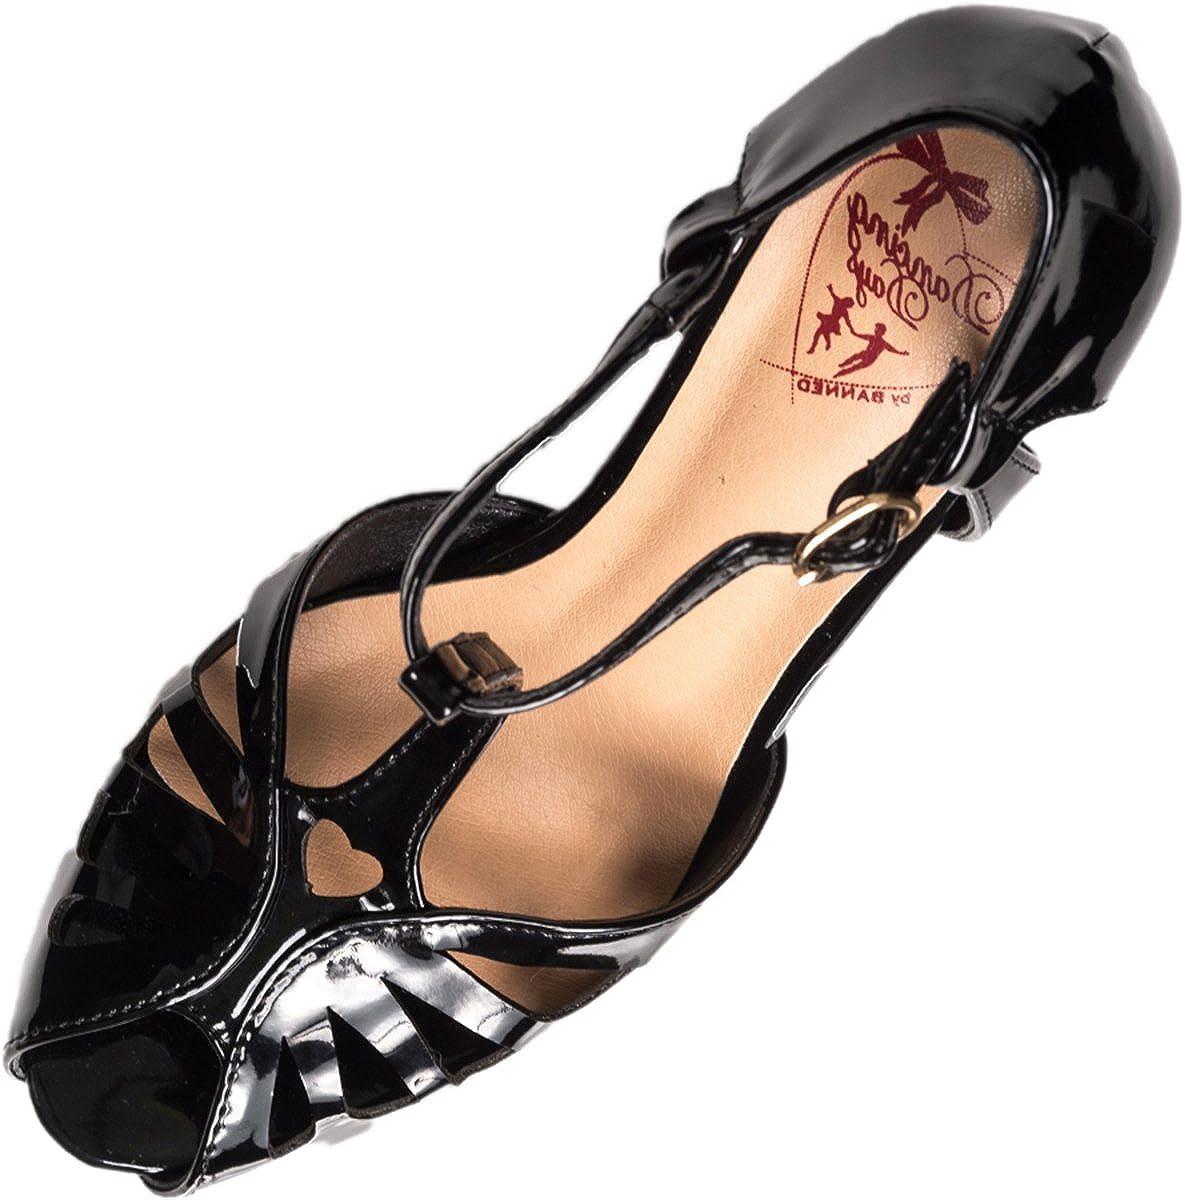 Dancing Days Damen Schuhe Secret Love Riemchen Peeptoe Pumps T-Spange T-Spange T-Spange e5bcf5